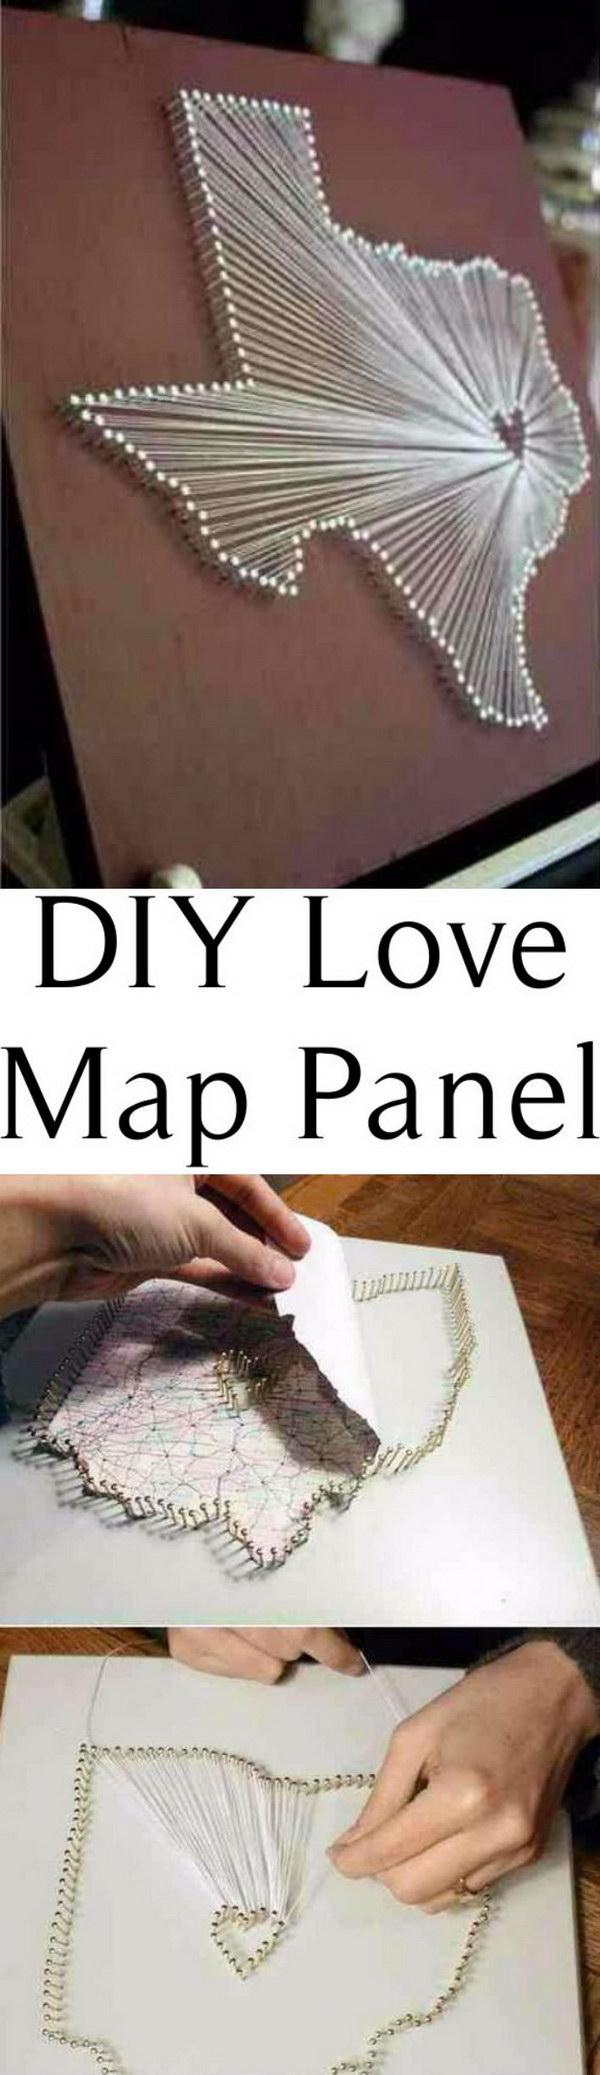 DIY Love Map Panel .